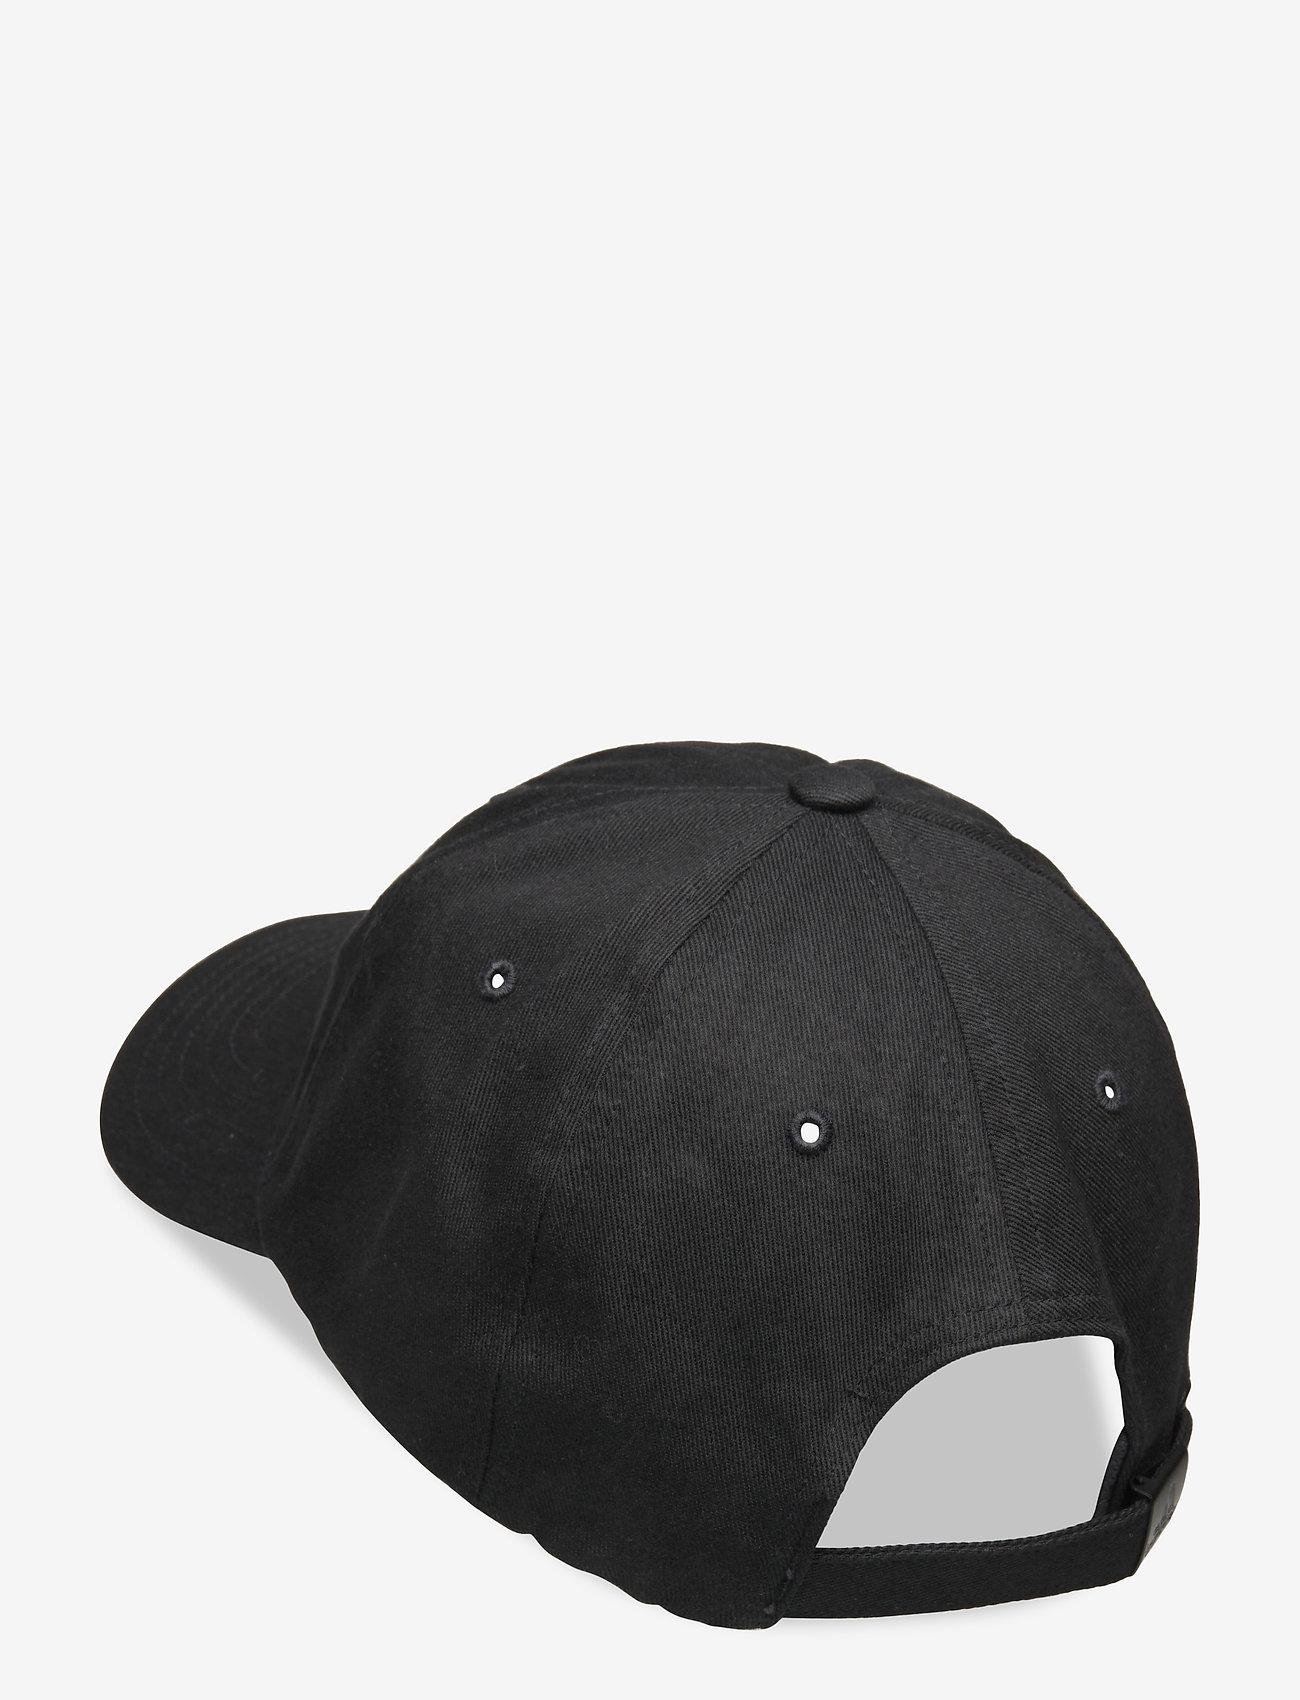 adidas Golf - W NOVELTY HAT - caps - black - 1